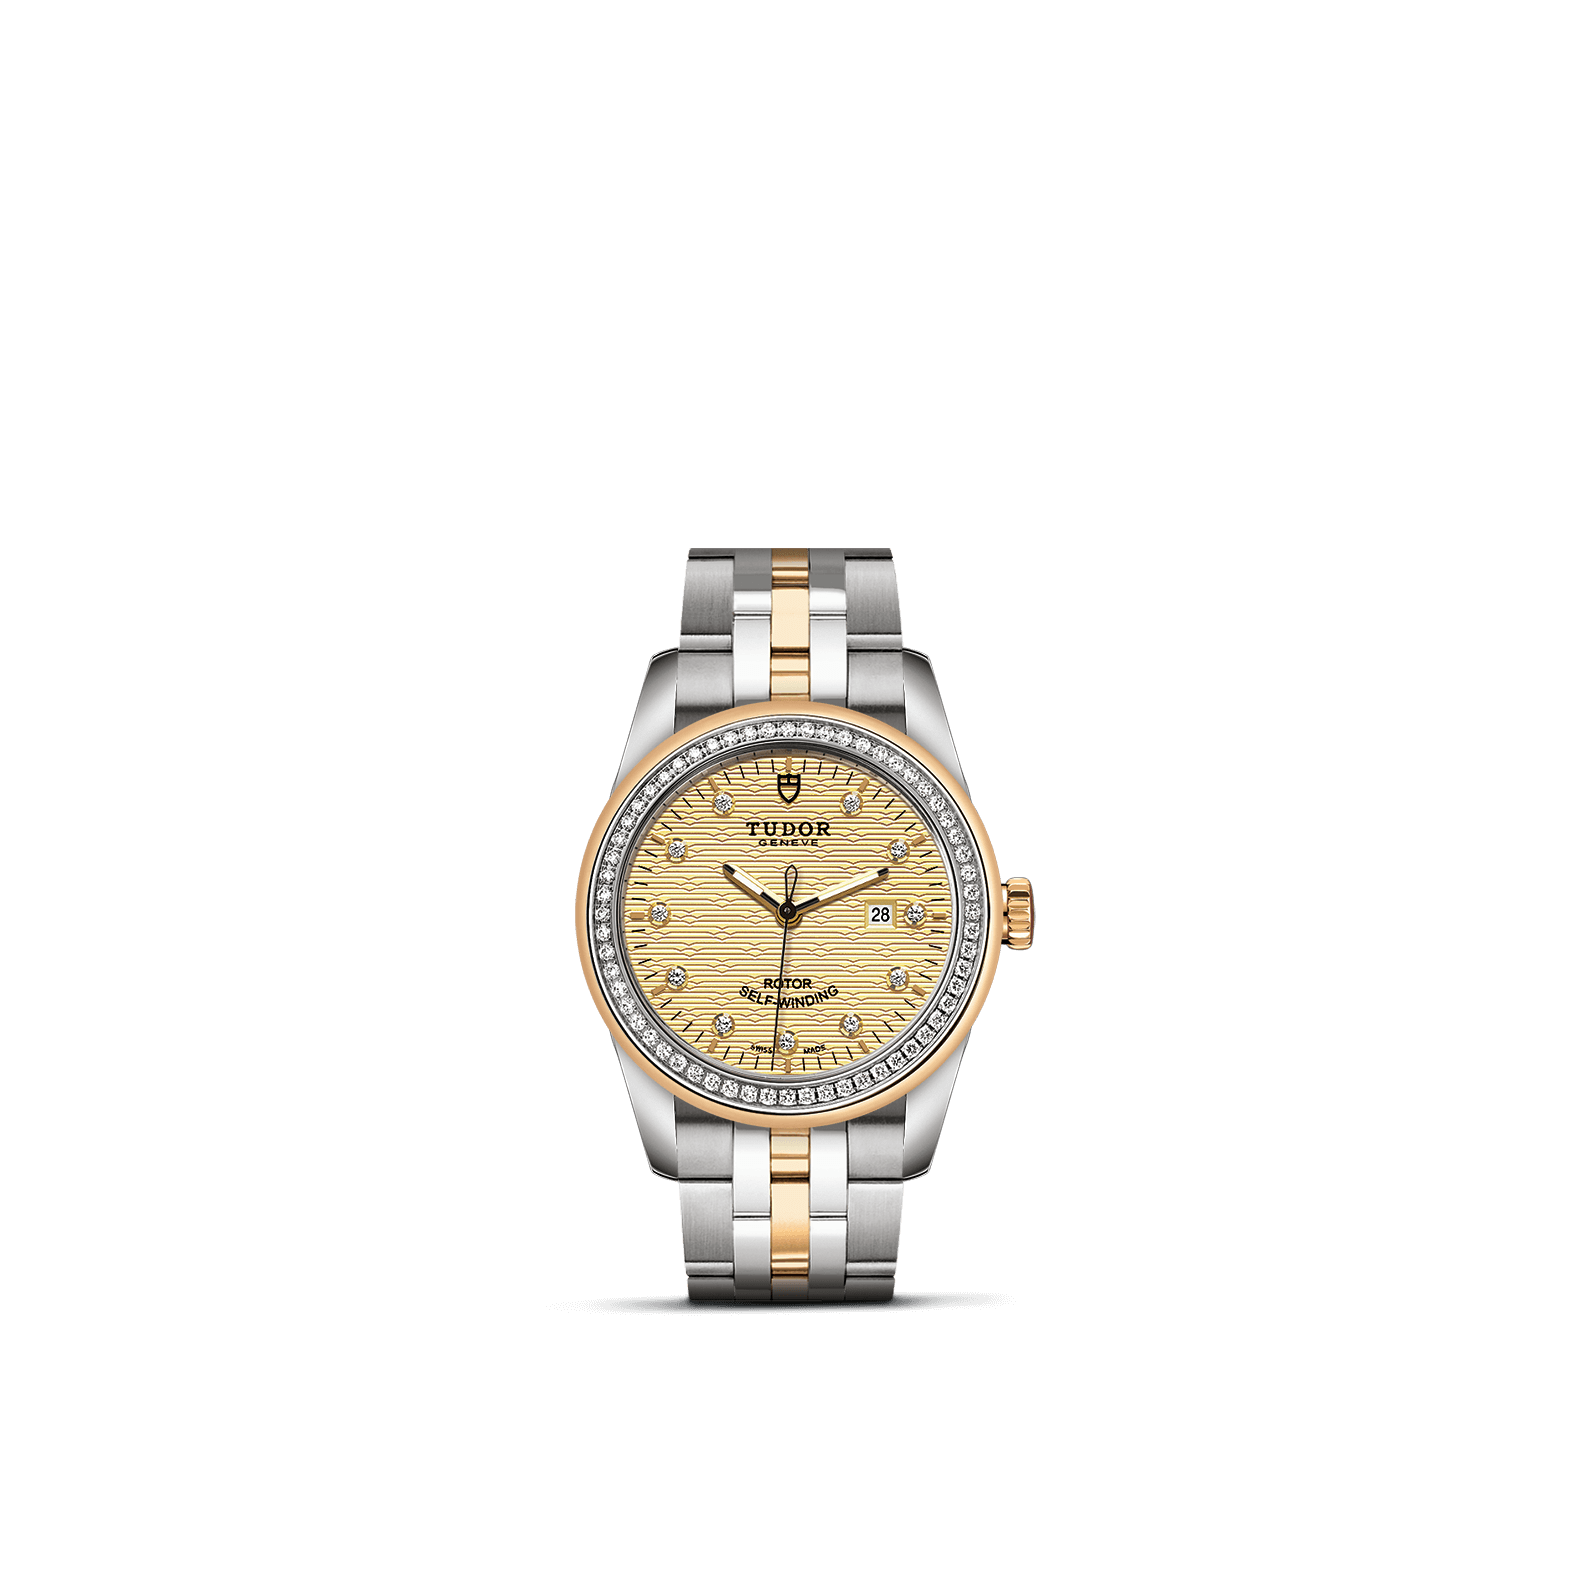 Orologio  TUDOR Glamour Date presso A. Dupanloup - Orologeria e gioielleria a